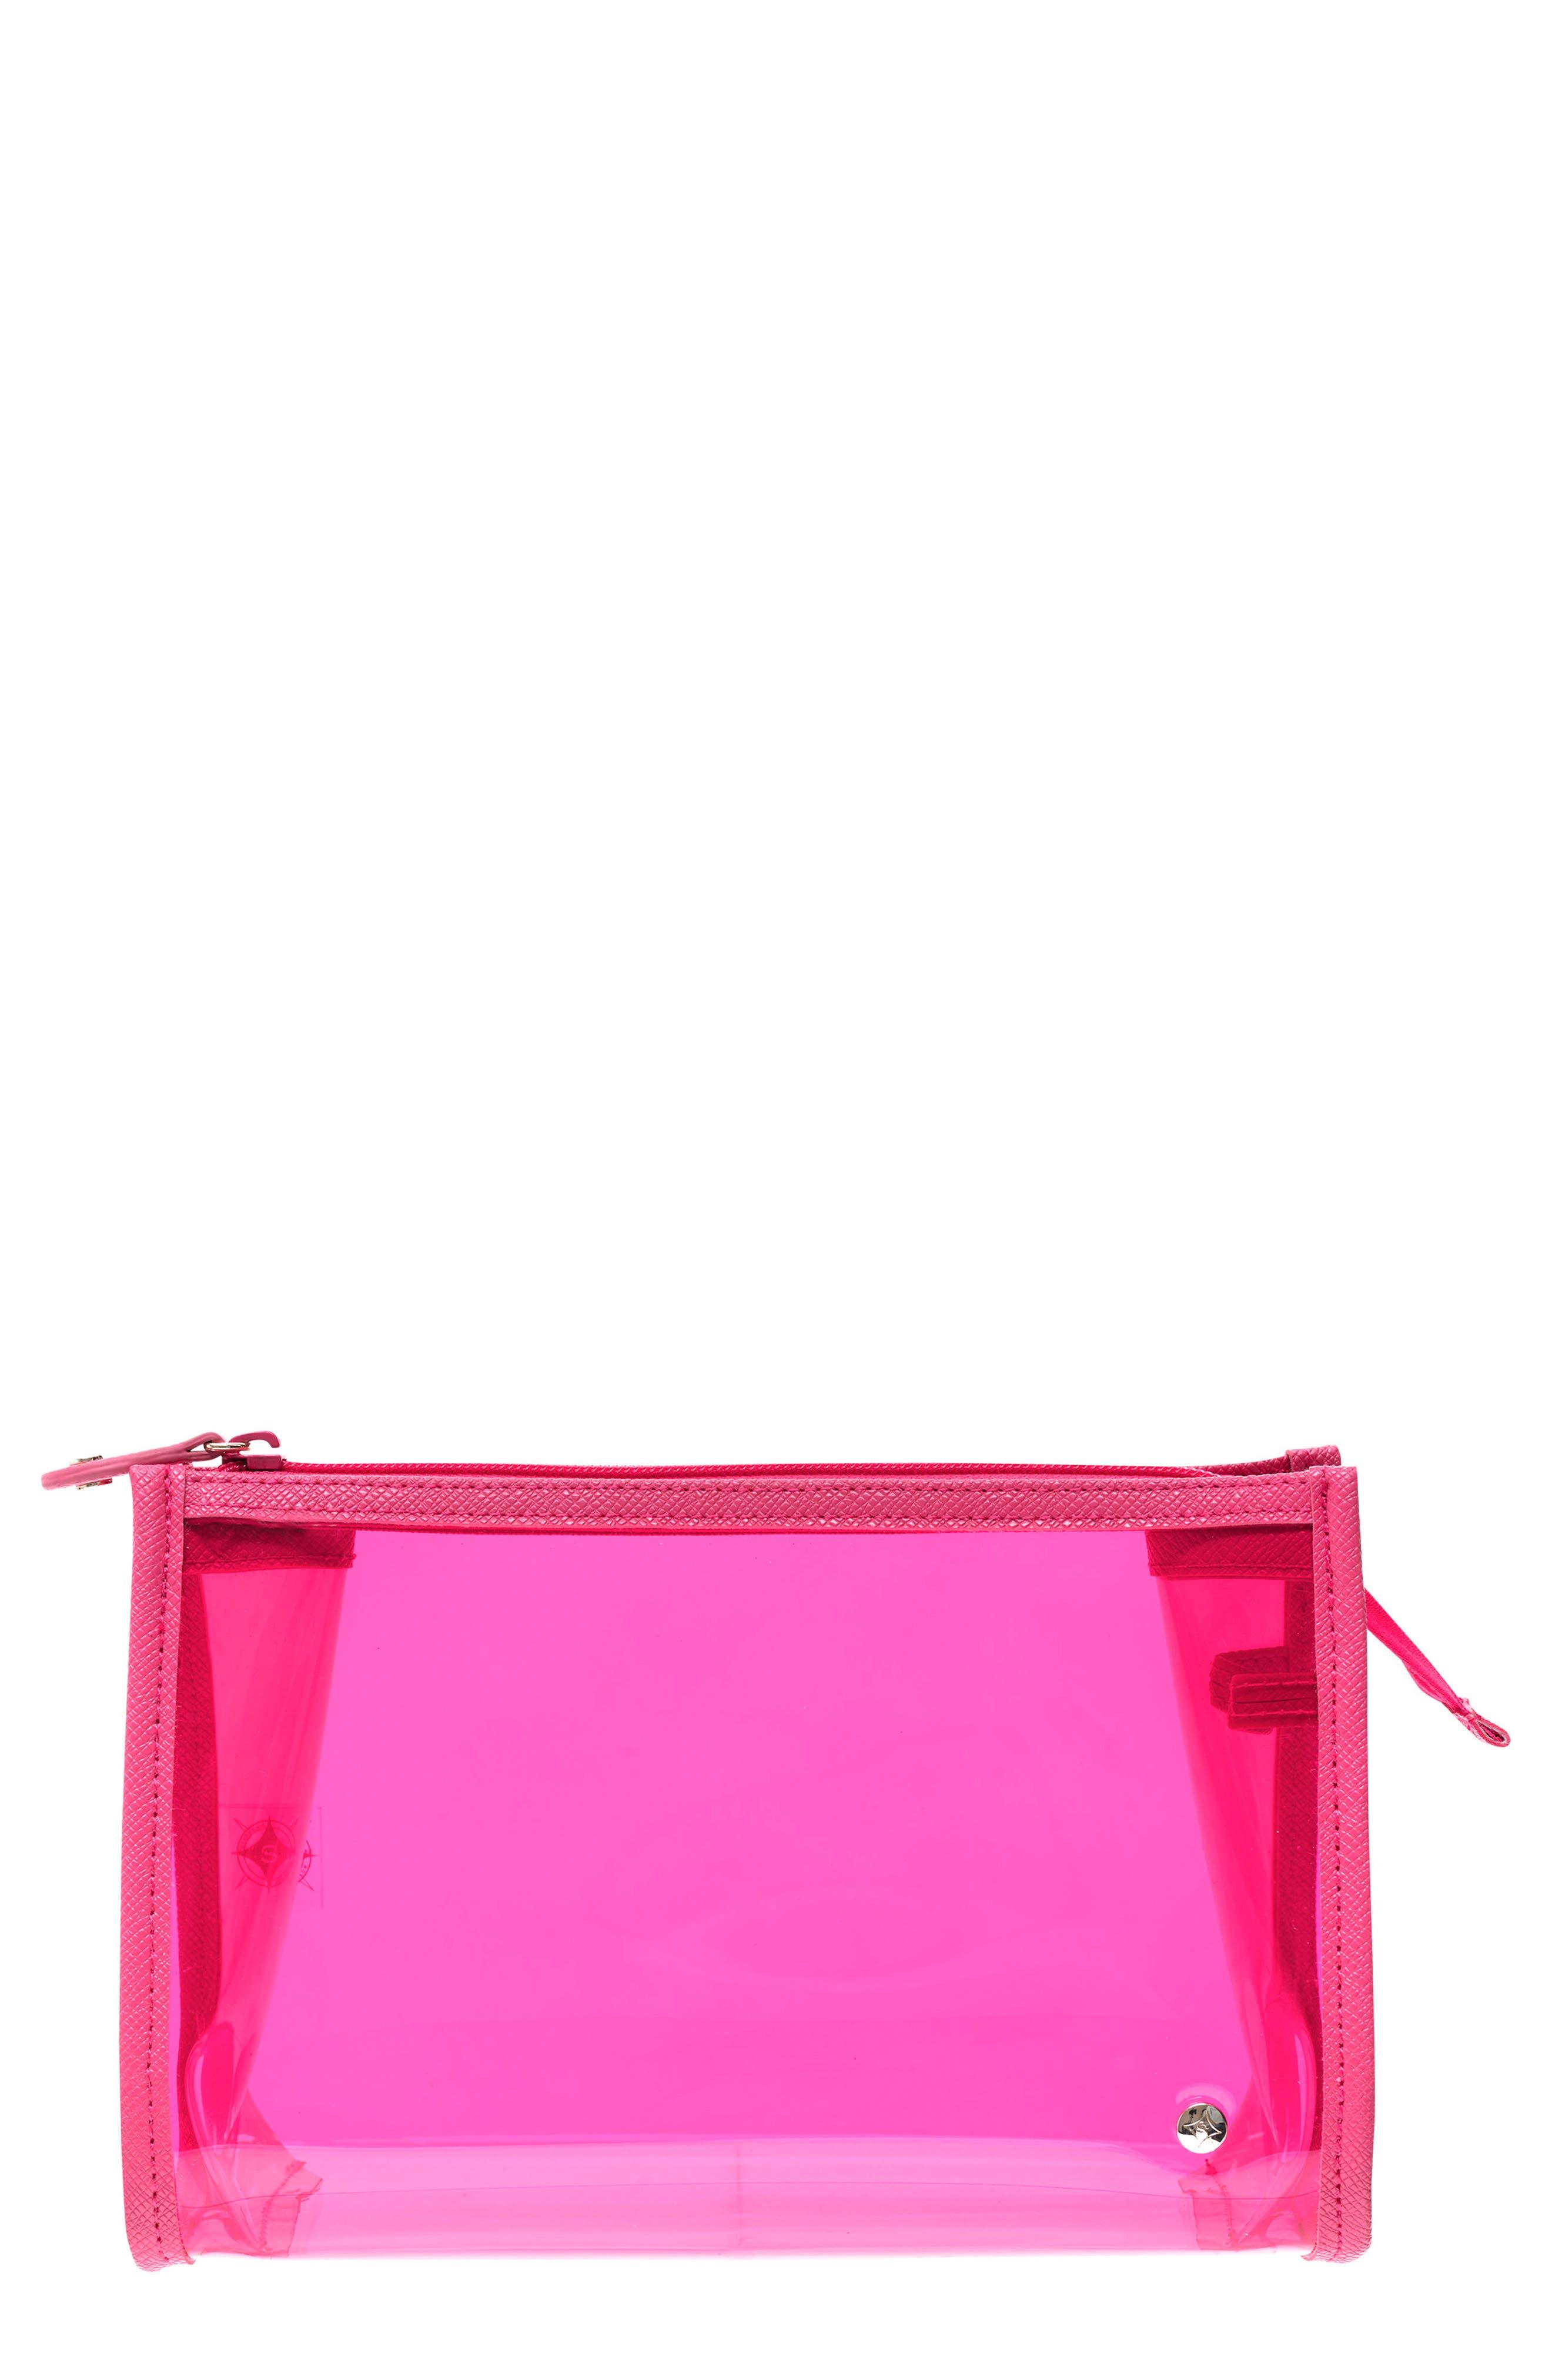 Miami Medium Zip Closure Cosmetics Case,                             Main thumbnail 1, color,                             Miami Neon Pink